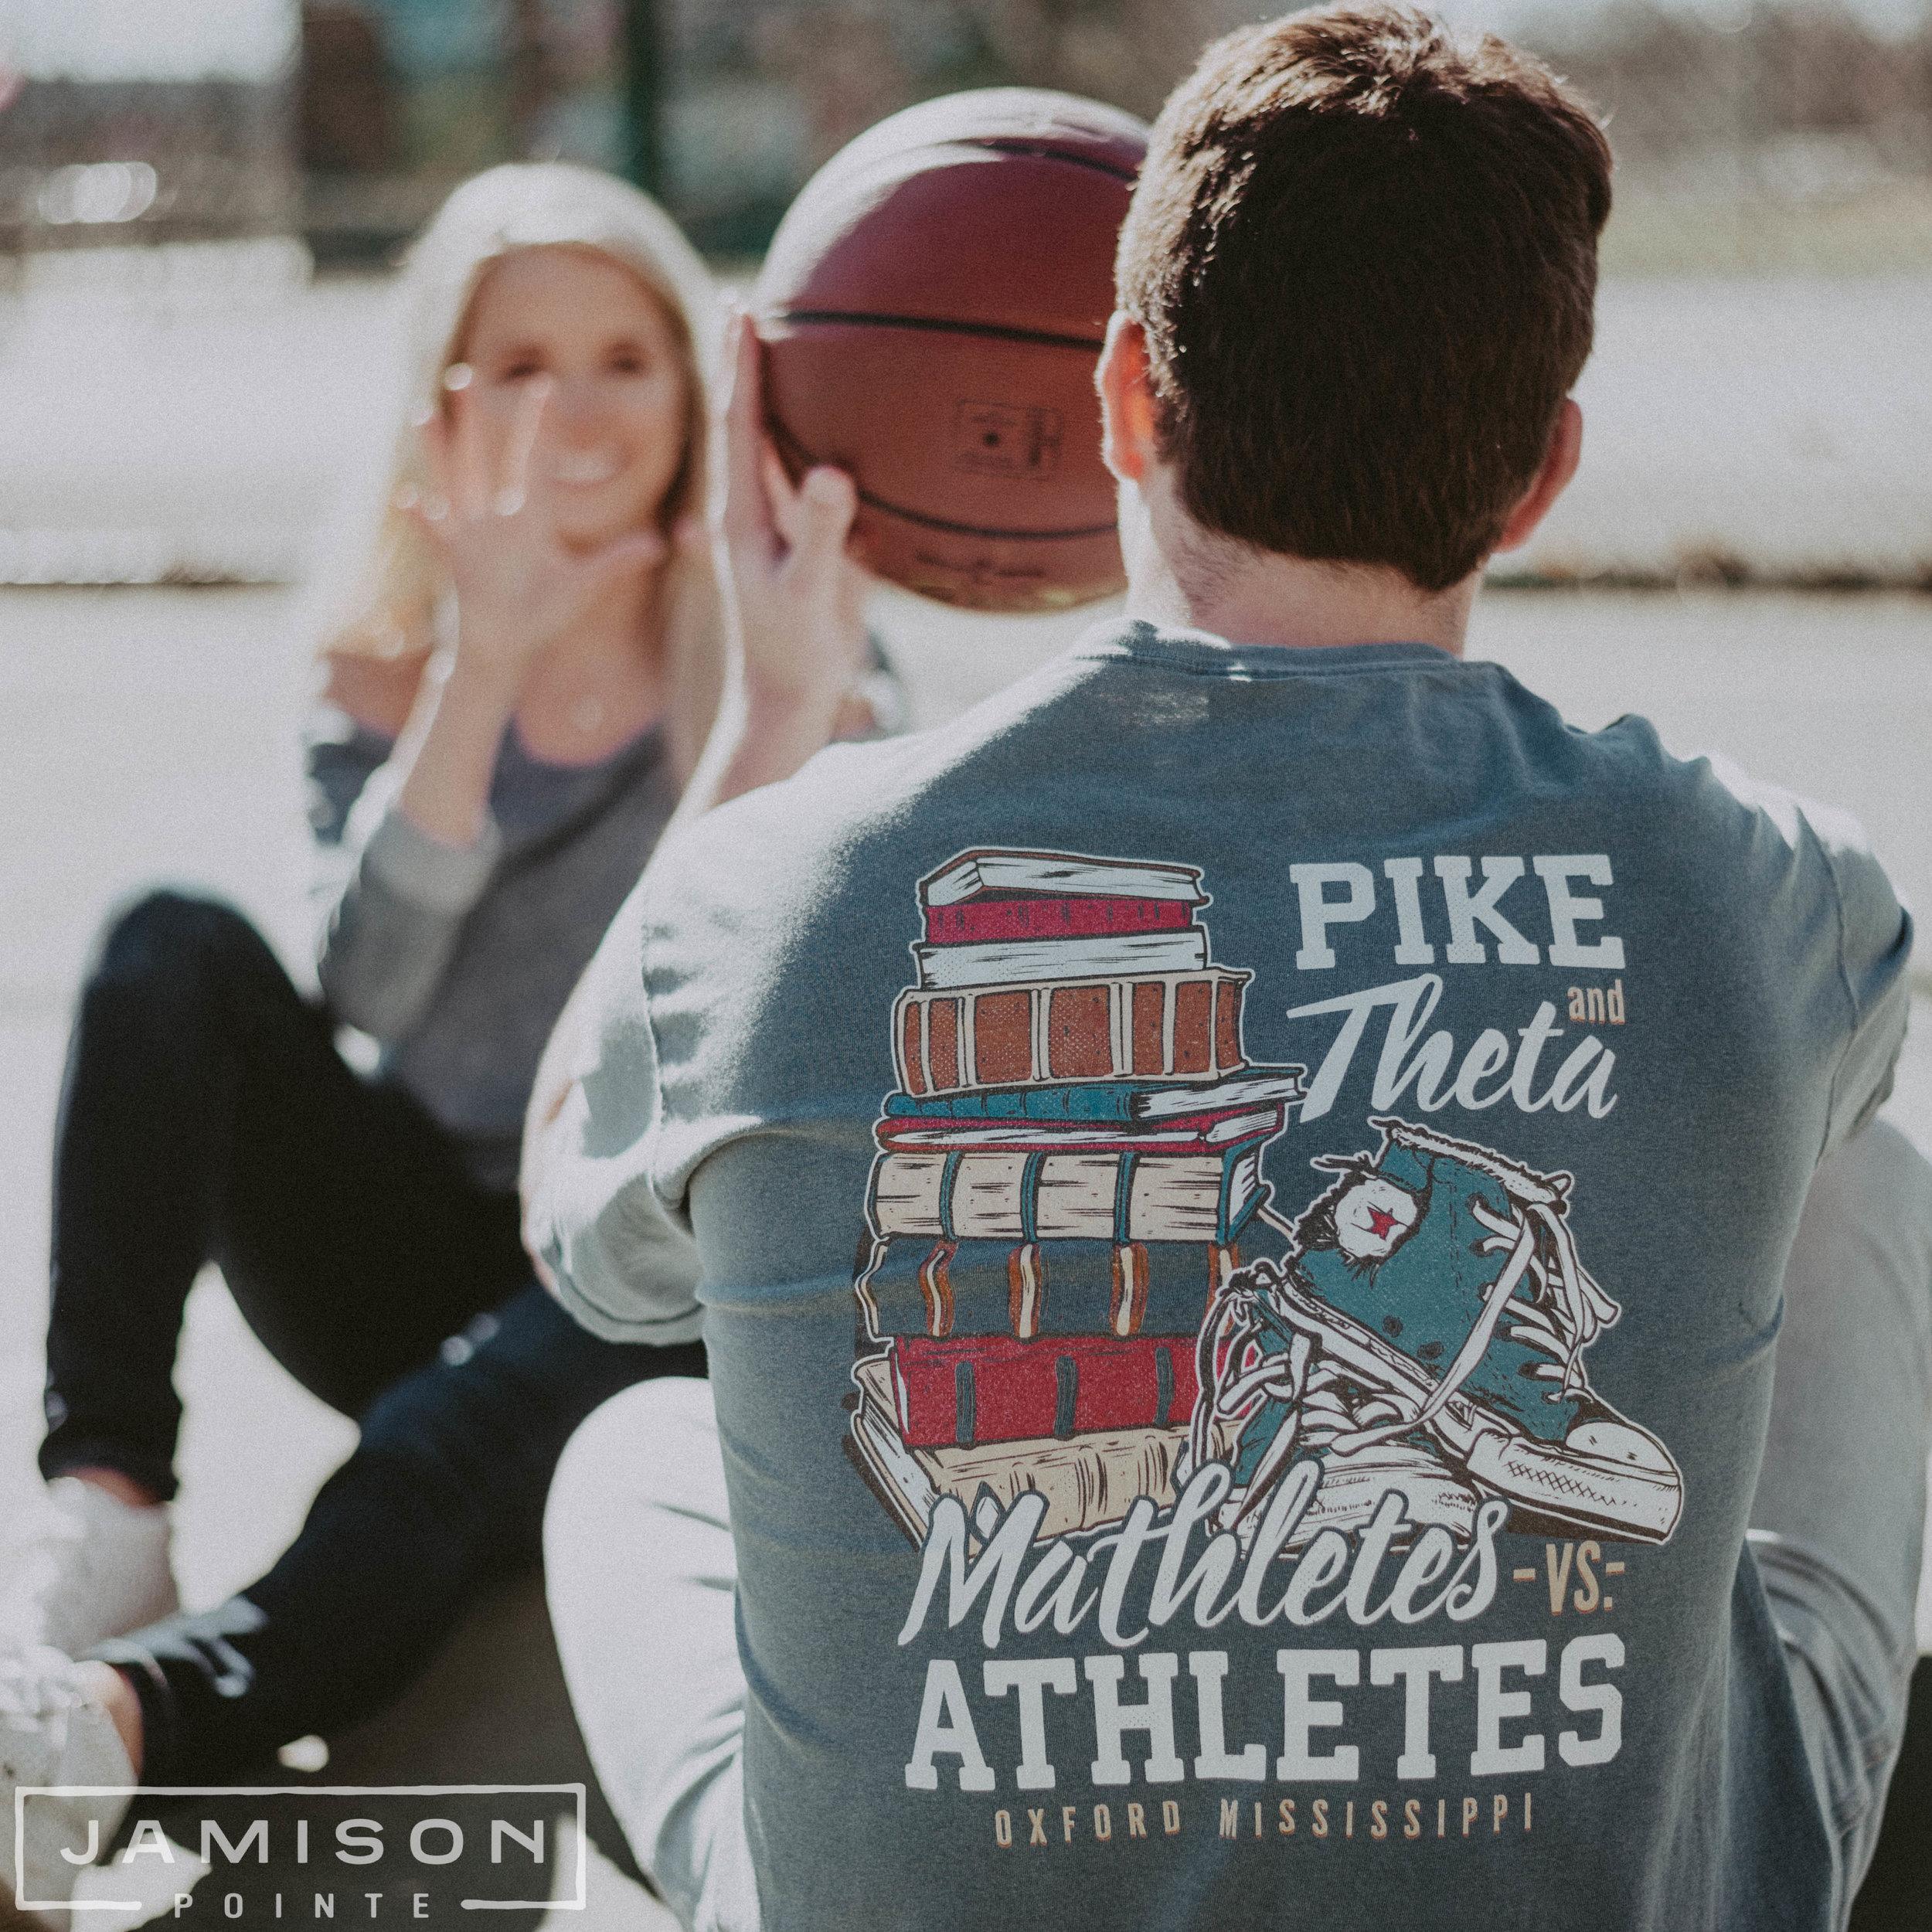 Pike Mathletes Vs. Athletes Tshirt